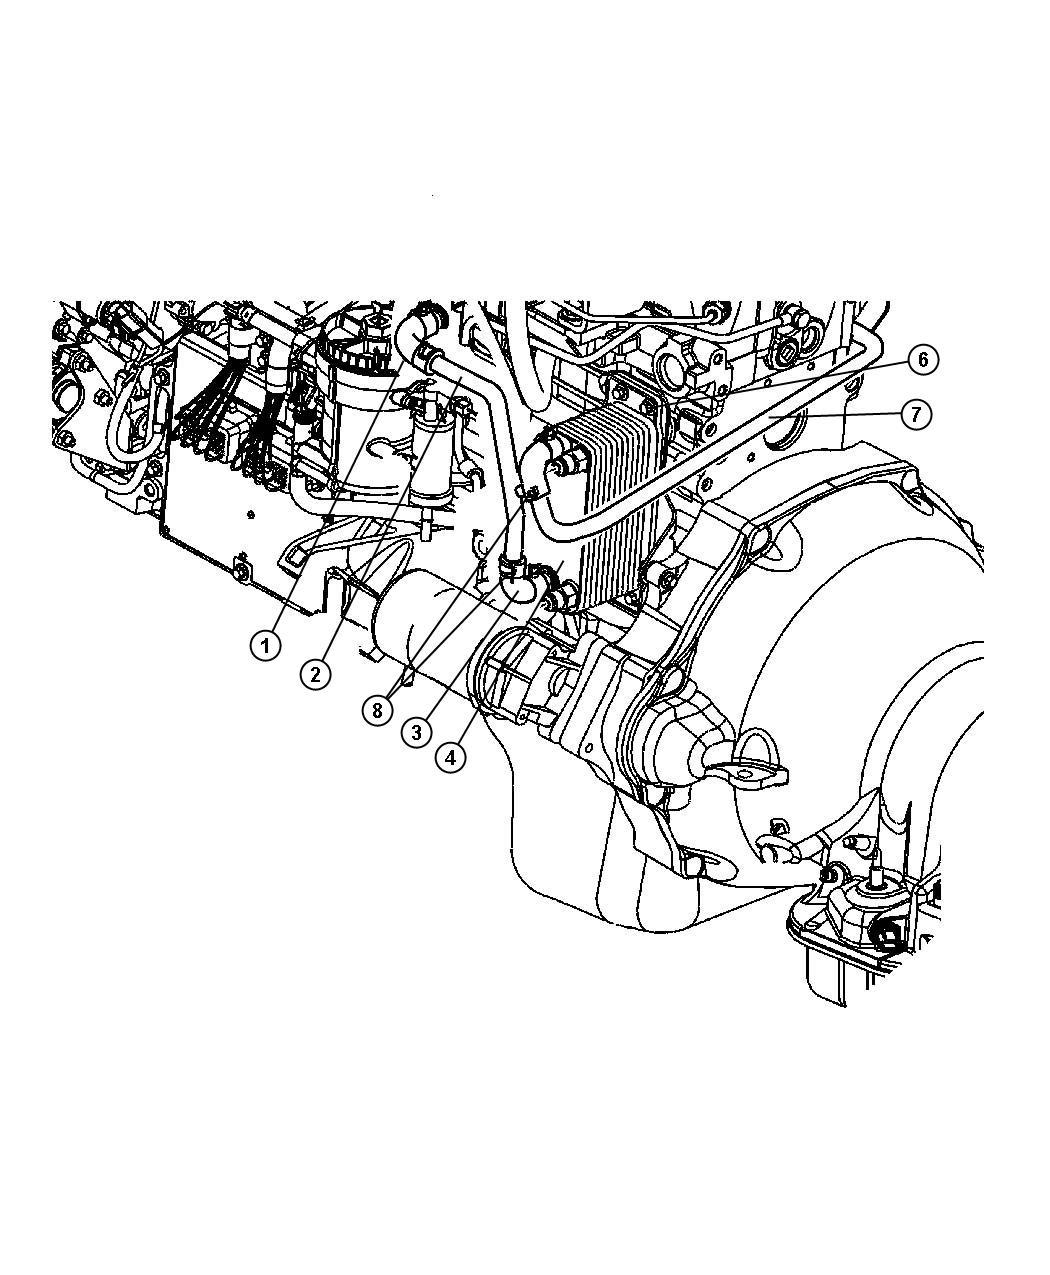 Dodge Ram Oil Cooler Water To Oilsel Engine